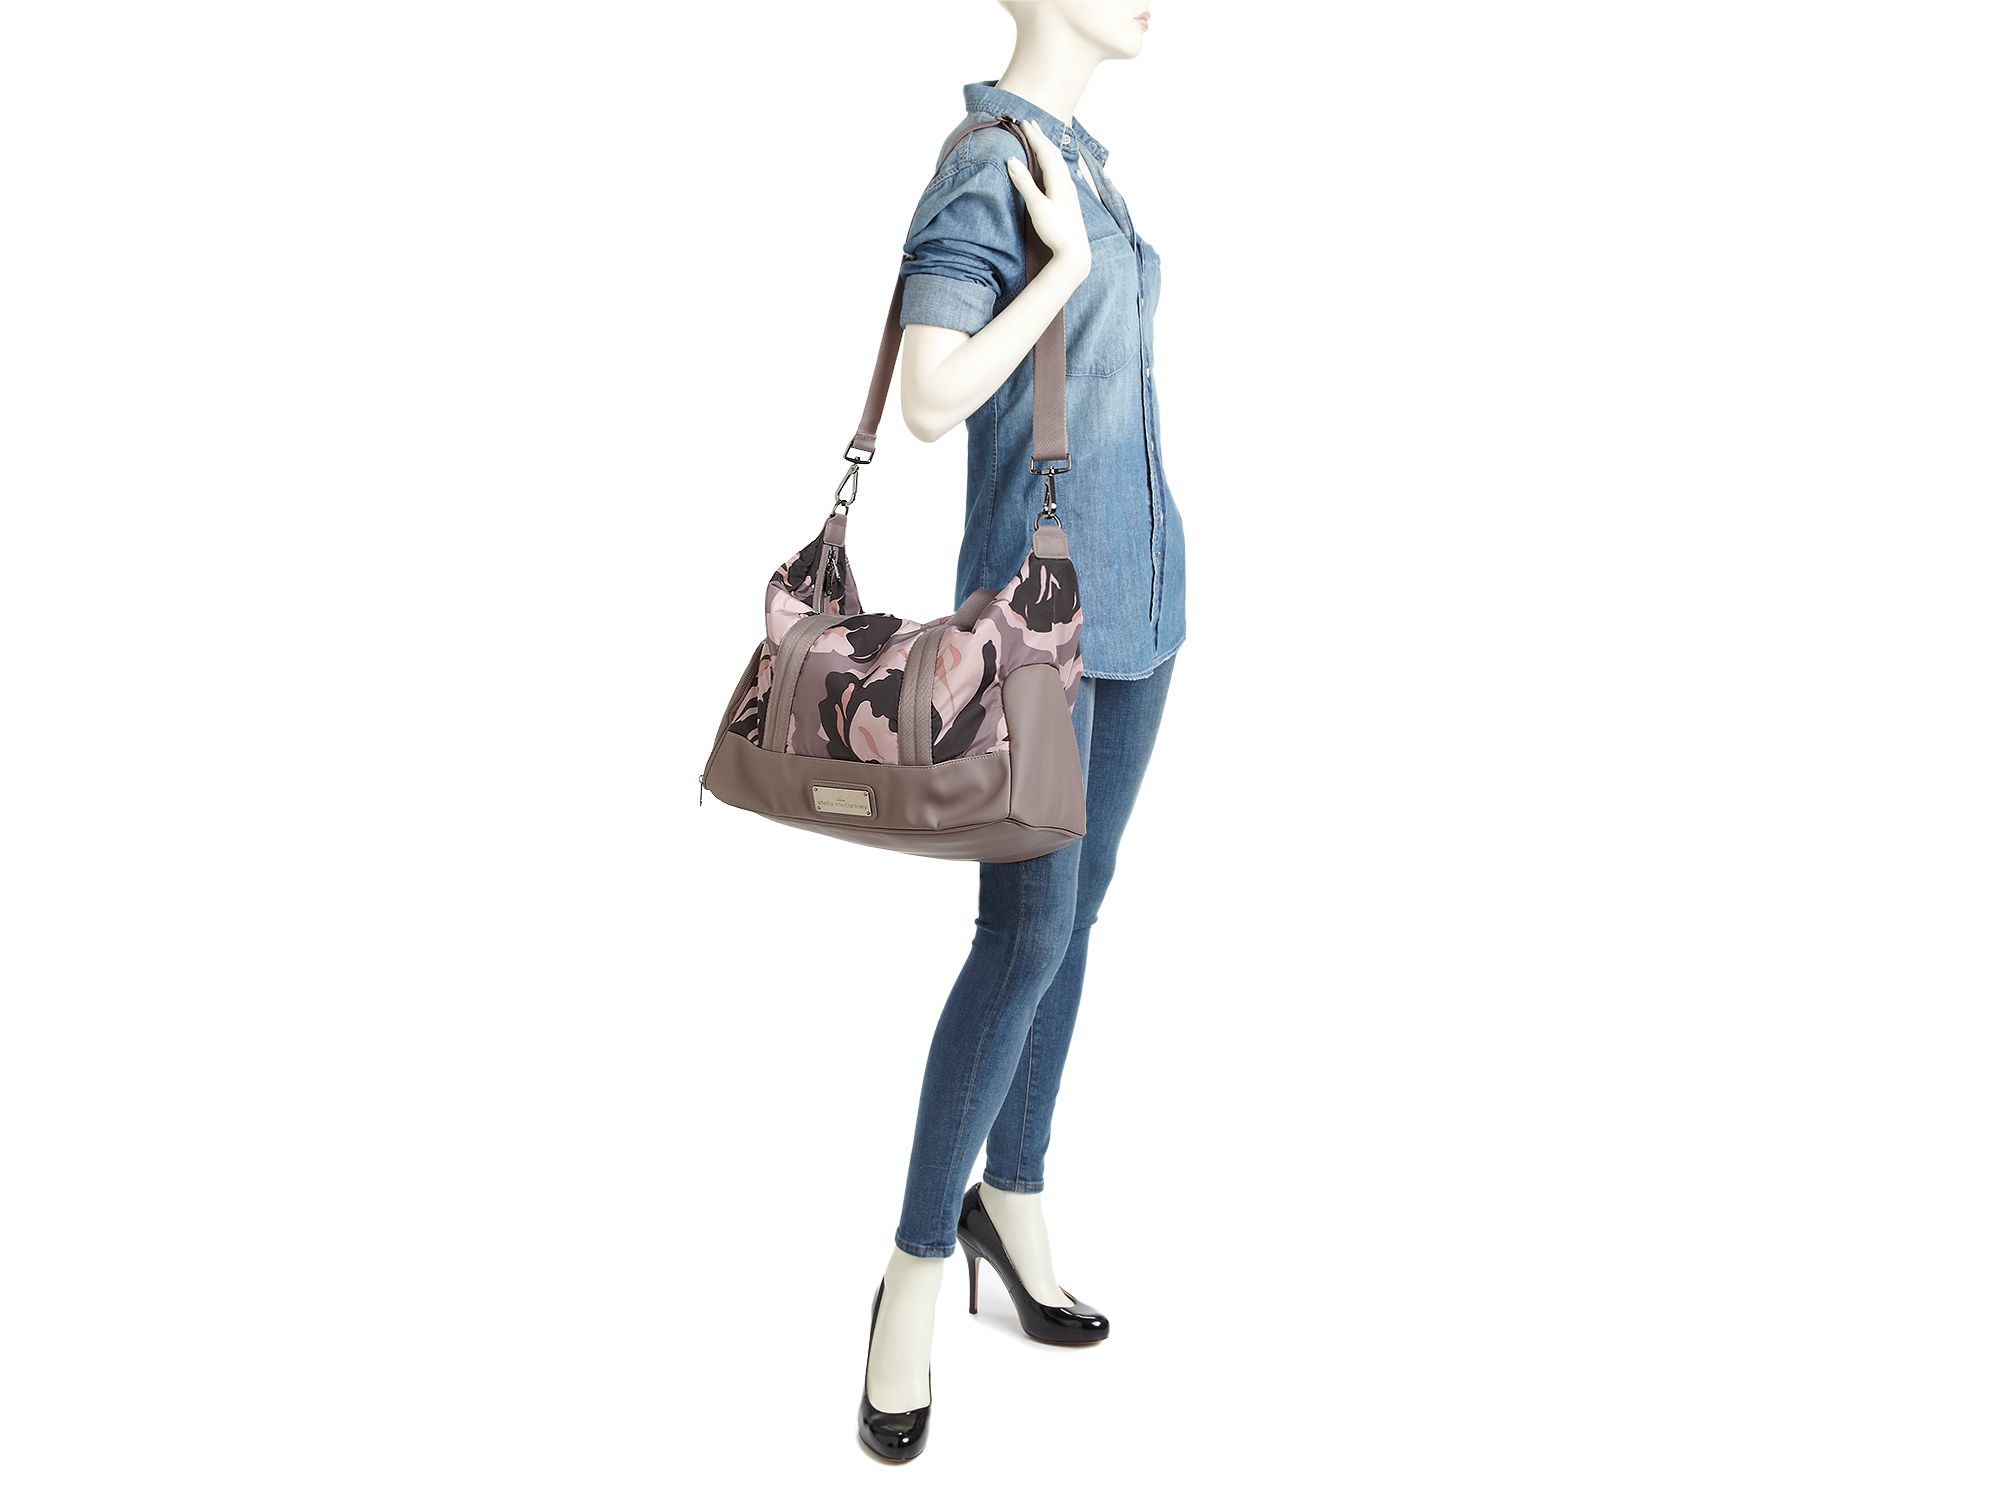 54d338ec0e Lyst - adidas By Stella McCartney Tote - Floral Camo Small Gym Bag ...